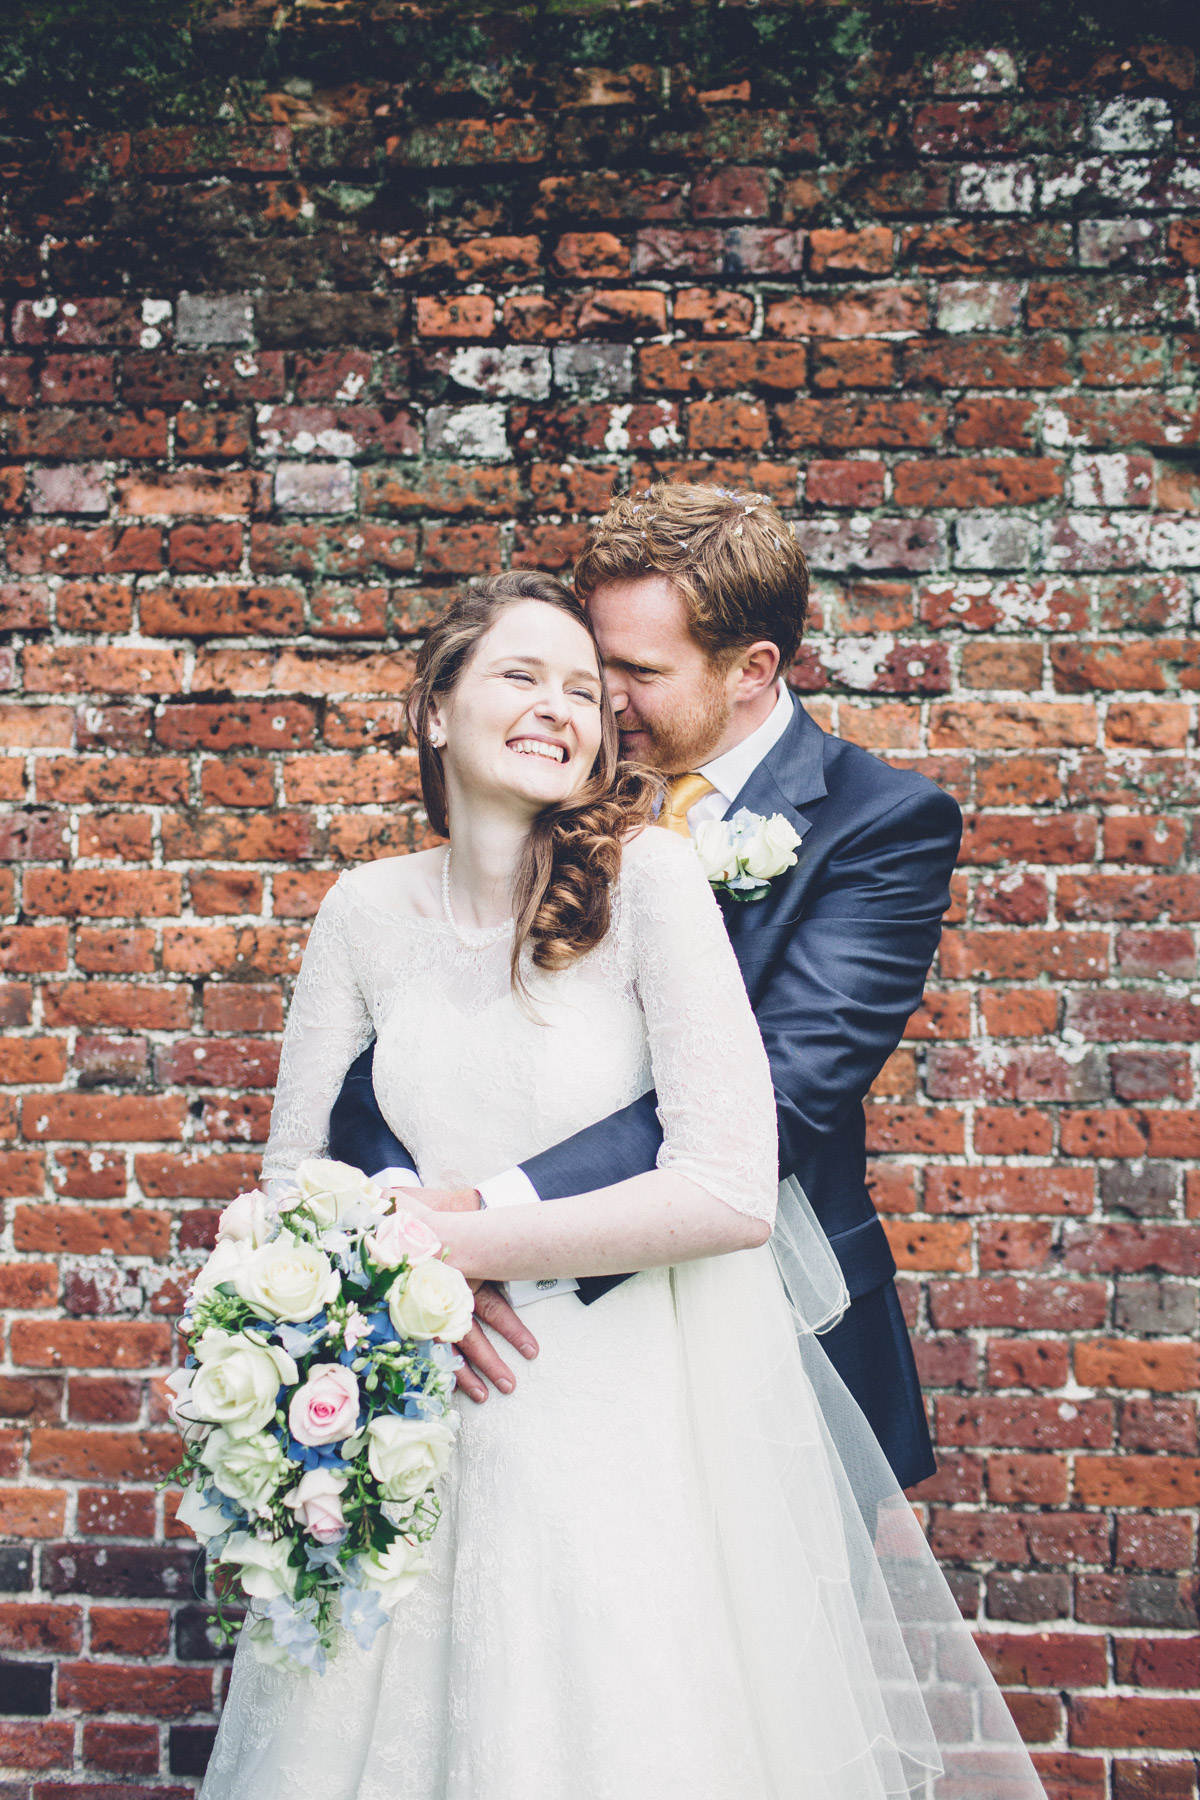 kate-gray-wedding-photography-169.jpg